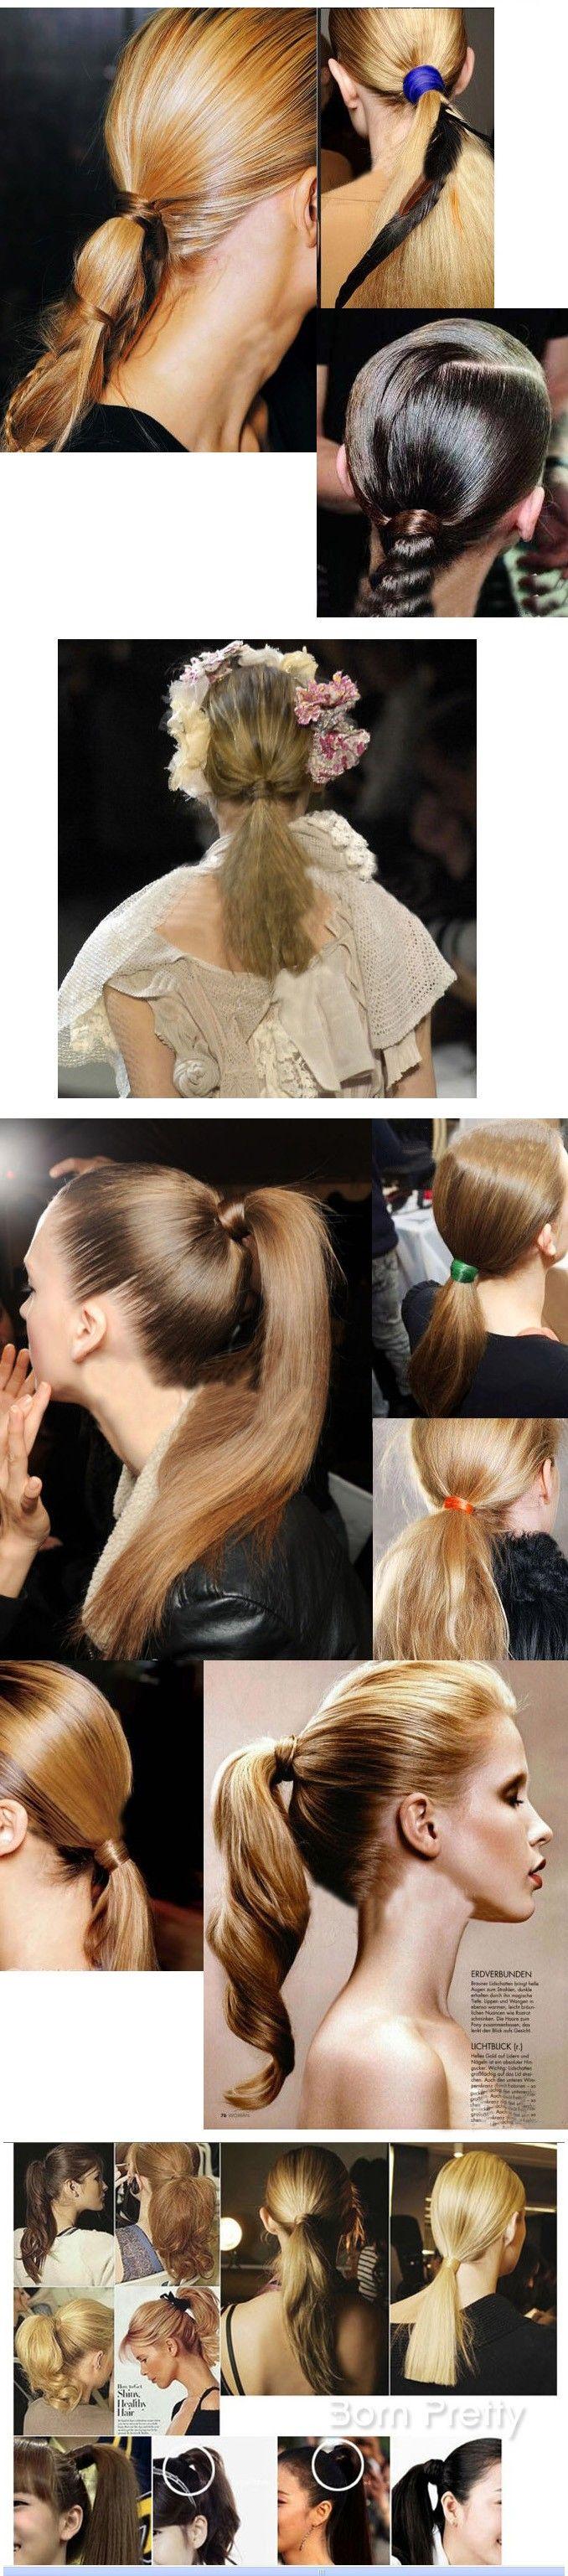 $1.92 Girl's Hairpiece Ponytail Holder Popular Hair Tie Band ( Random Color ) - BornPrettyStore.com